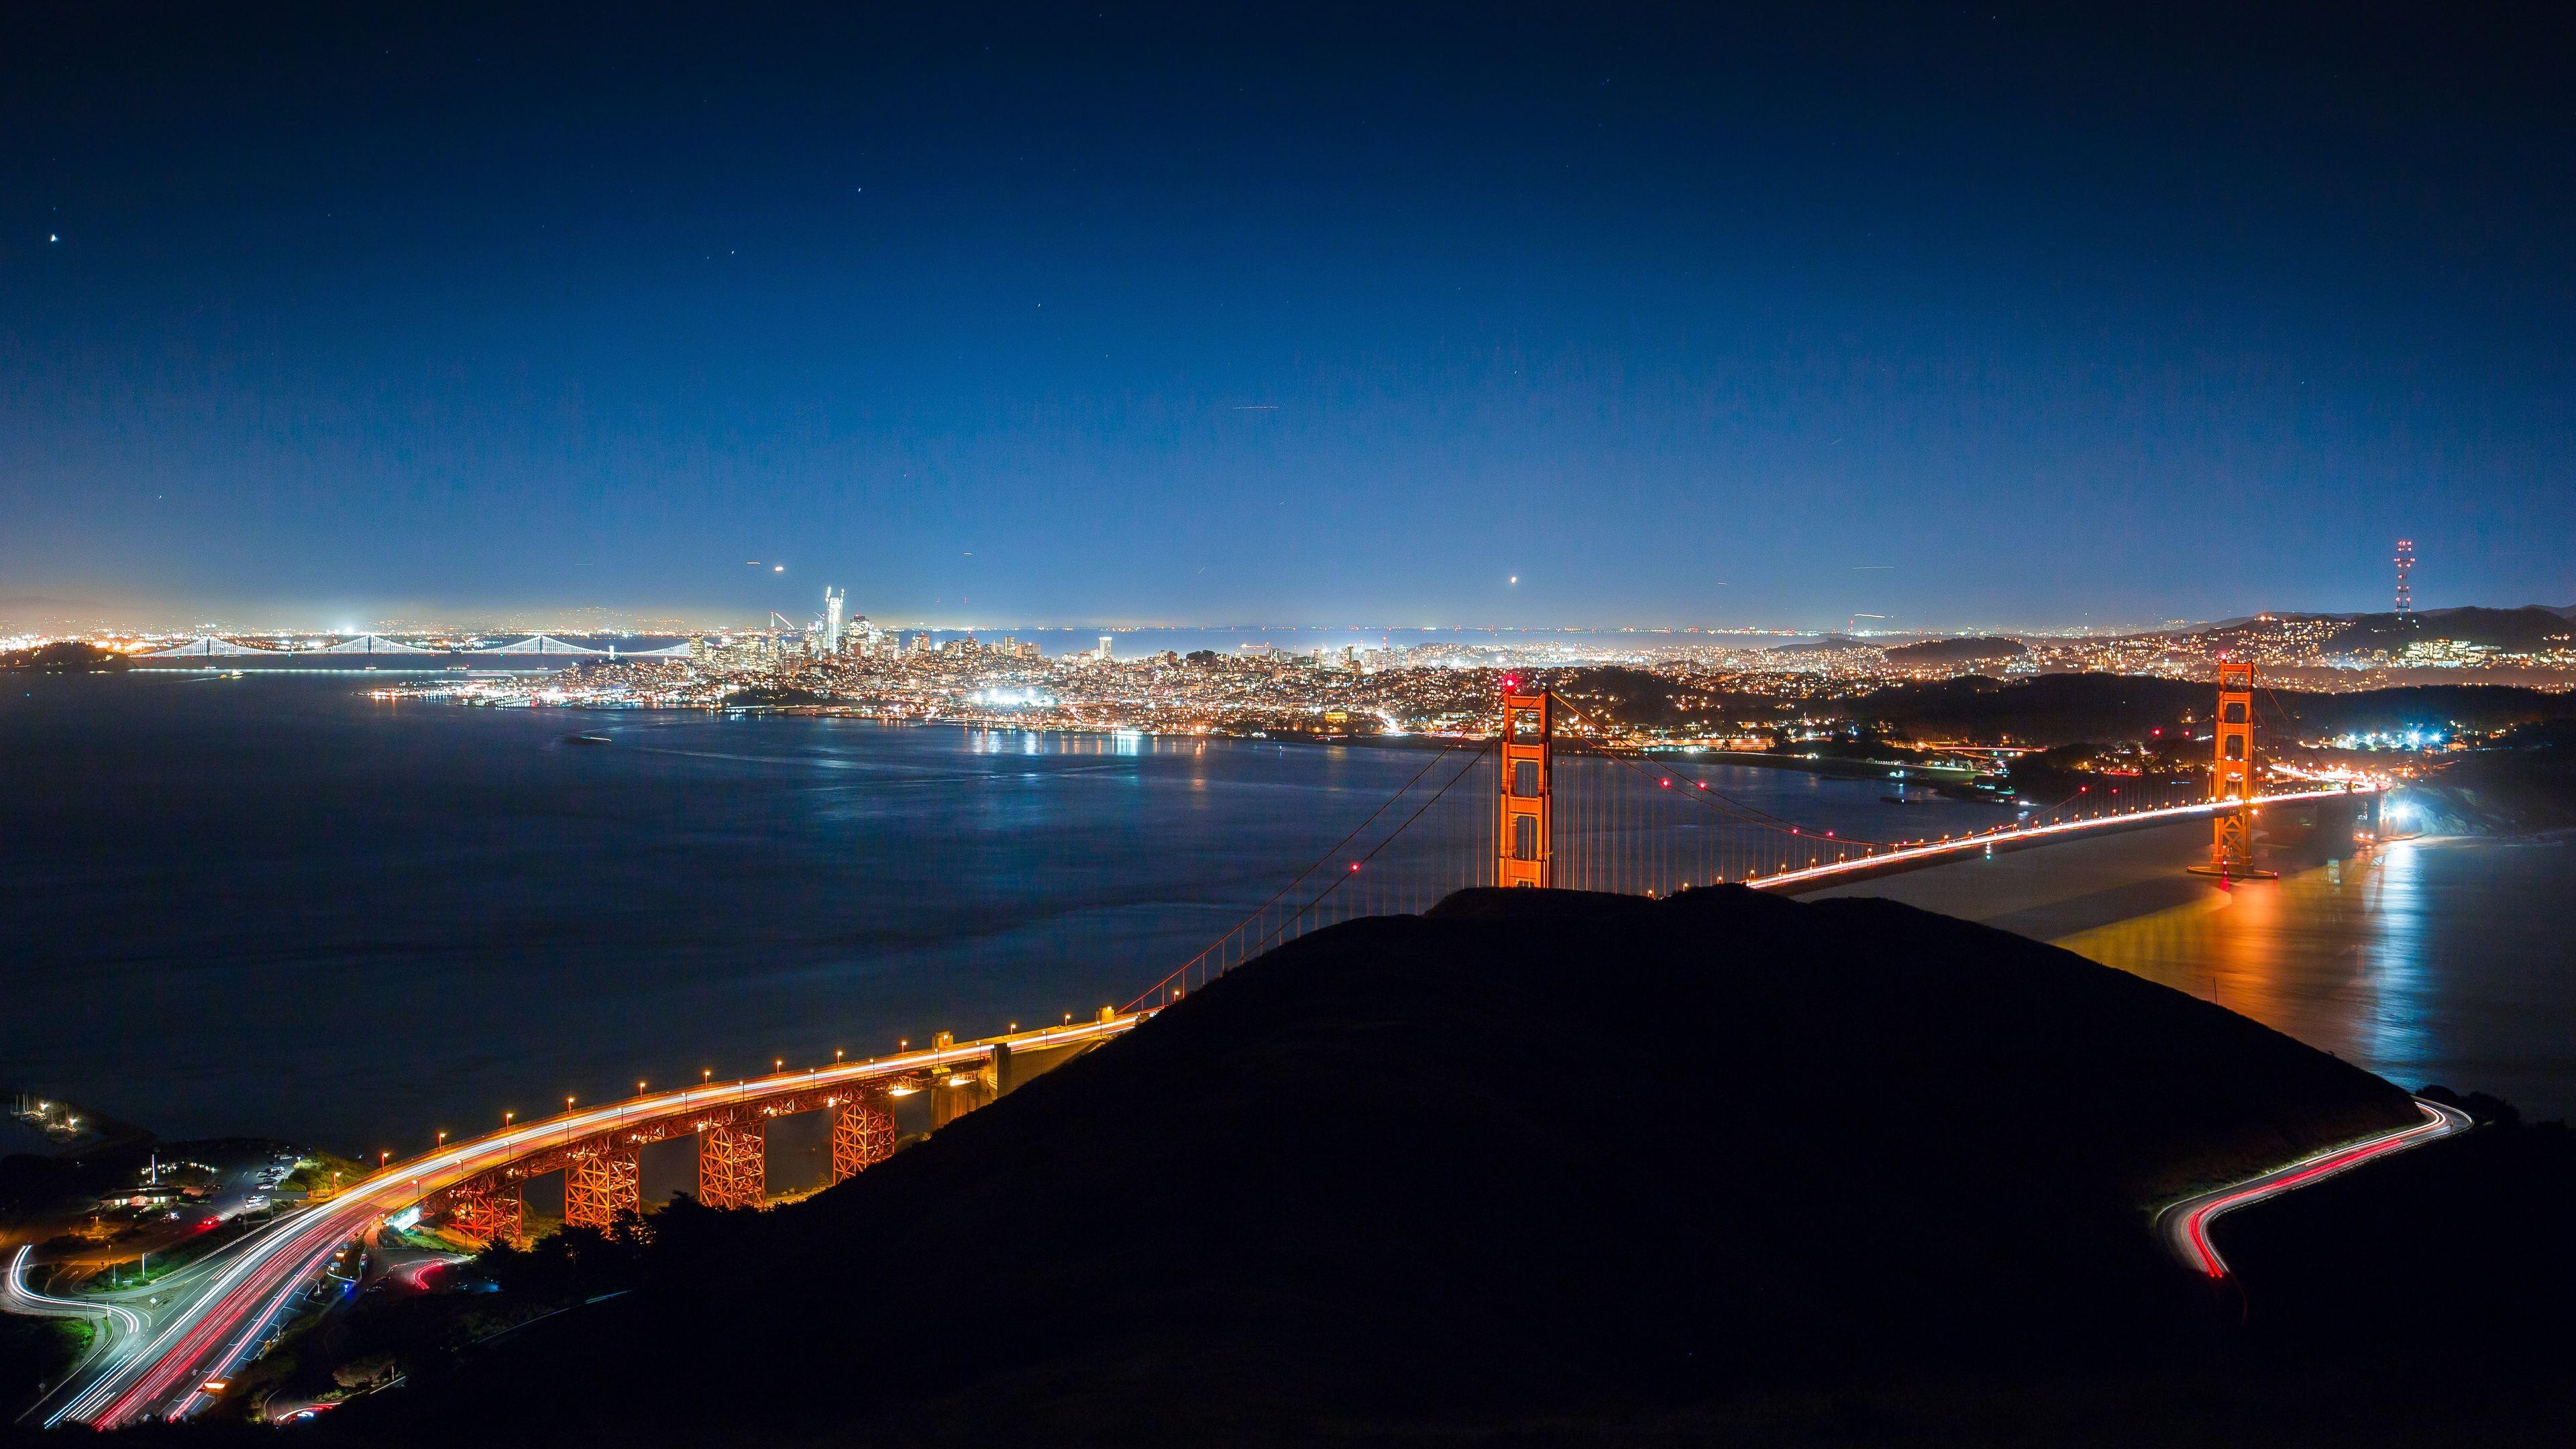 city lights san francisco 4k 1560535801 - City Lights San Francisco 4k - world wallpapers, san francisco wallpapers, photography wallpapers, lights wallpapers, hd-wallpapers, city wallpapers, 4k-wallpapers